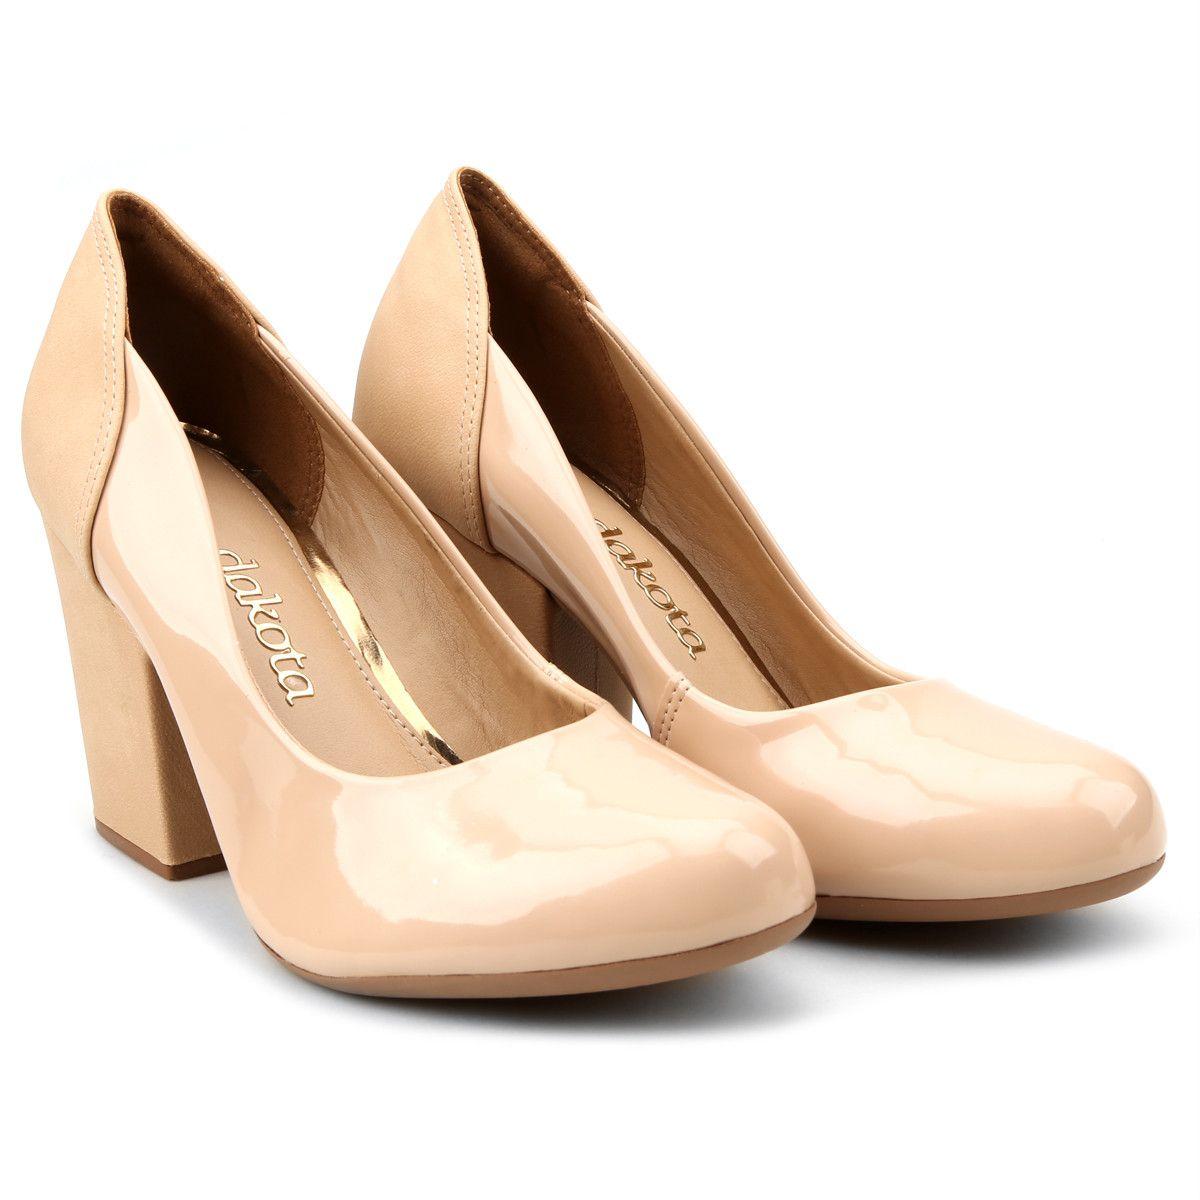 79620a05c Compre Scarpin Dakota Salto Grosso Bege na Zattini a nova loja de moda  online da Netshoes